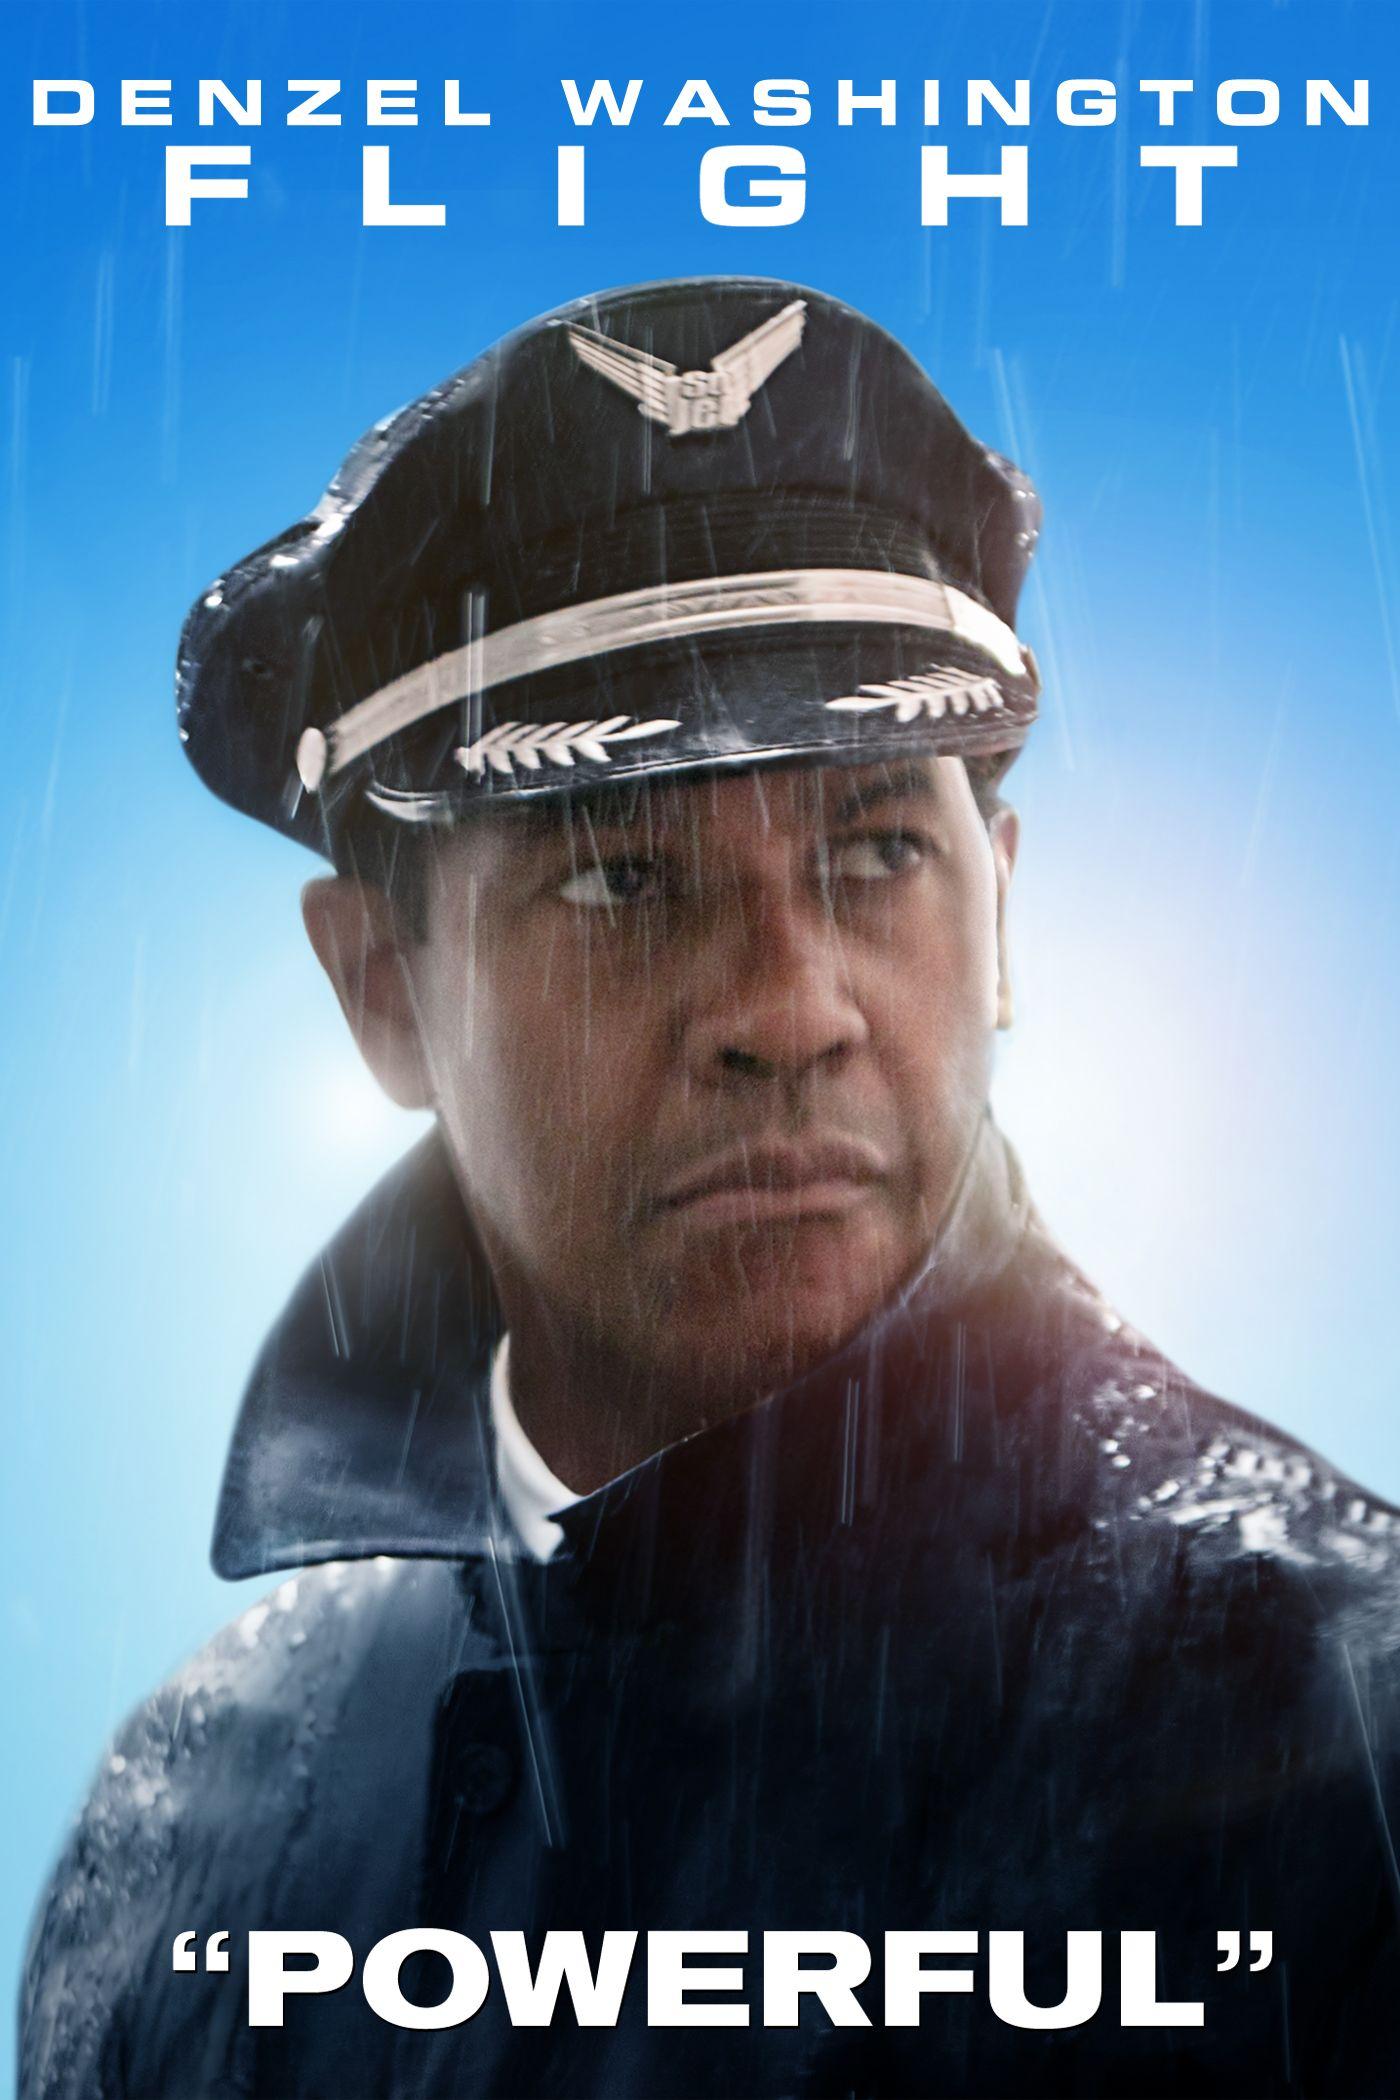 denzel washington movie posters flight poster artwork